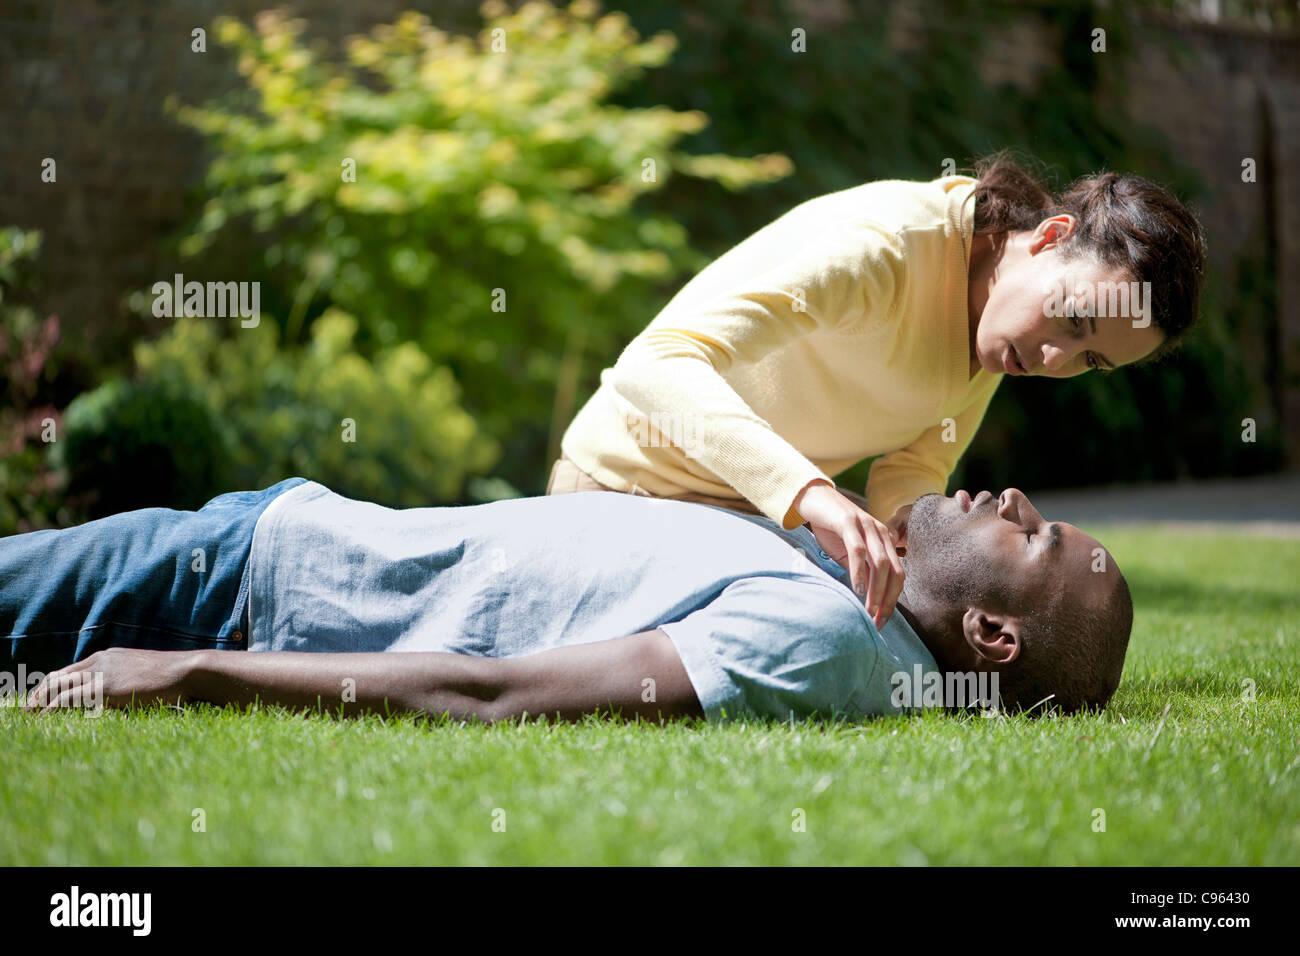 Adult cardiopulmonary resuscitation (CPR) - Stock Image